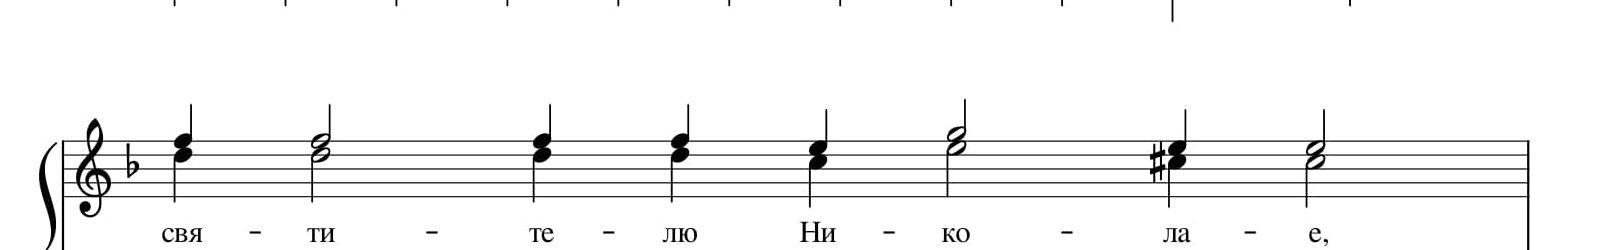 Стихира на литии свт. Николаю, 2 гл, лаврсикй напев